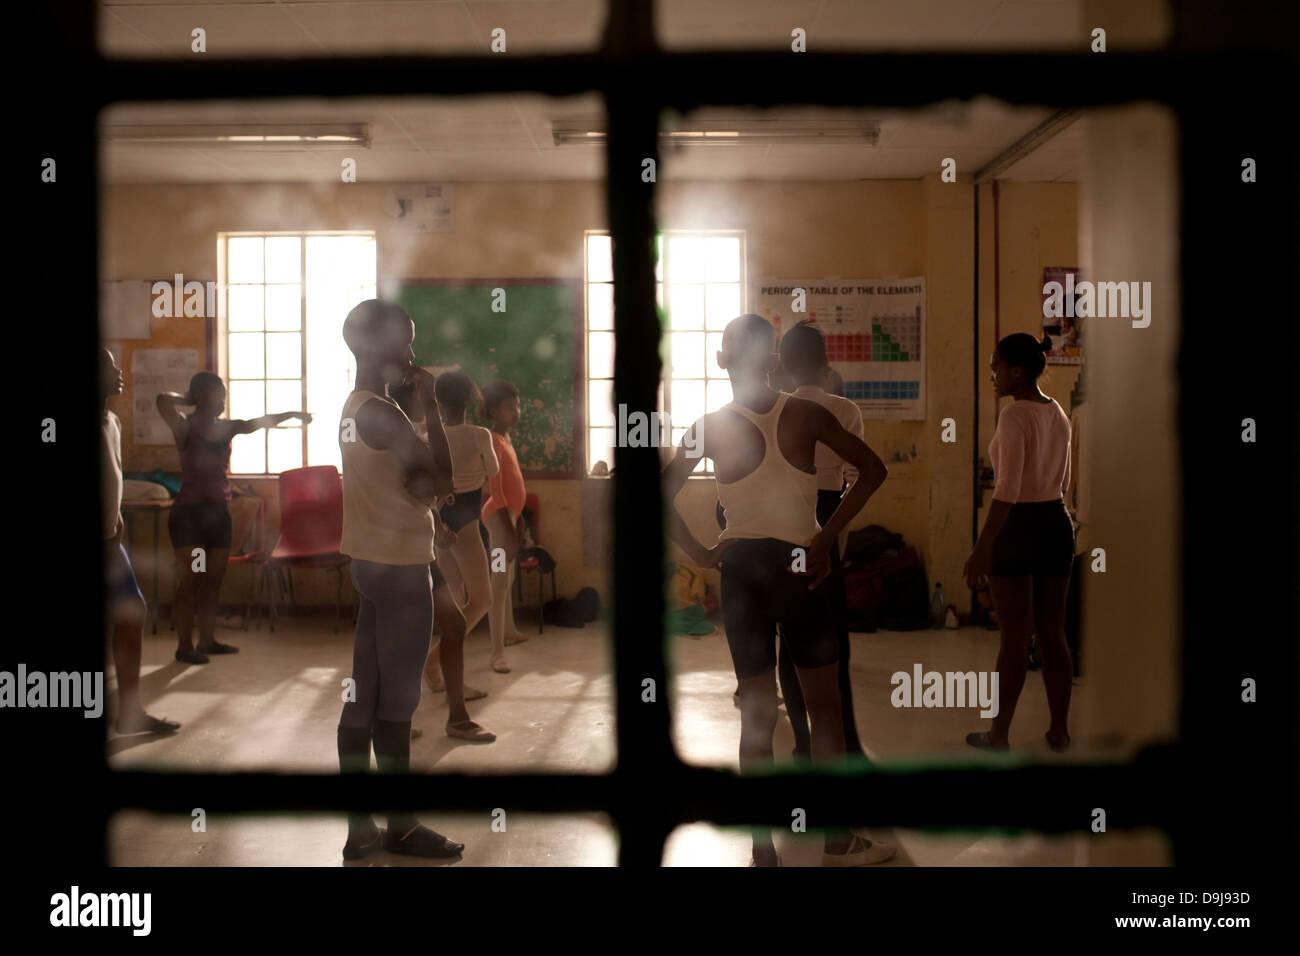 Hlengisa Primary School provides extracurricular dance training underprivileged children in Nyanga township Cape - Stock Image